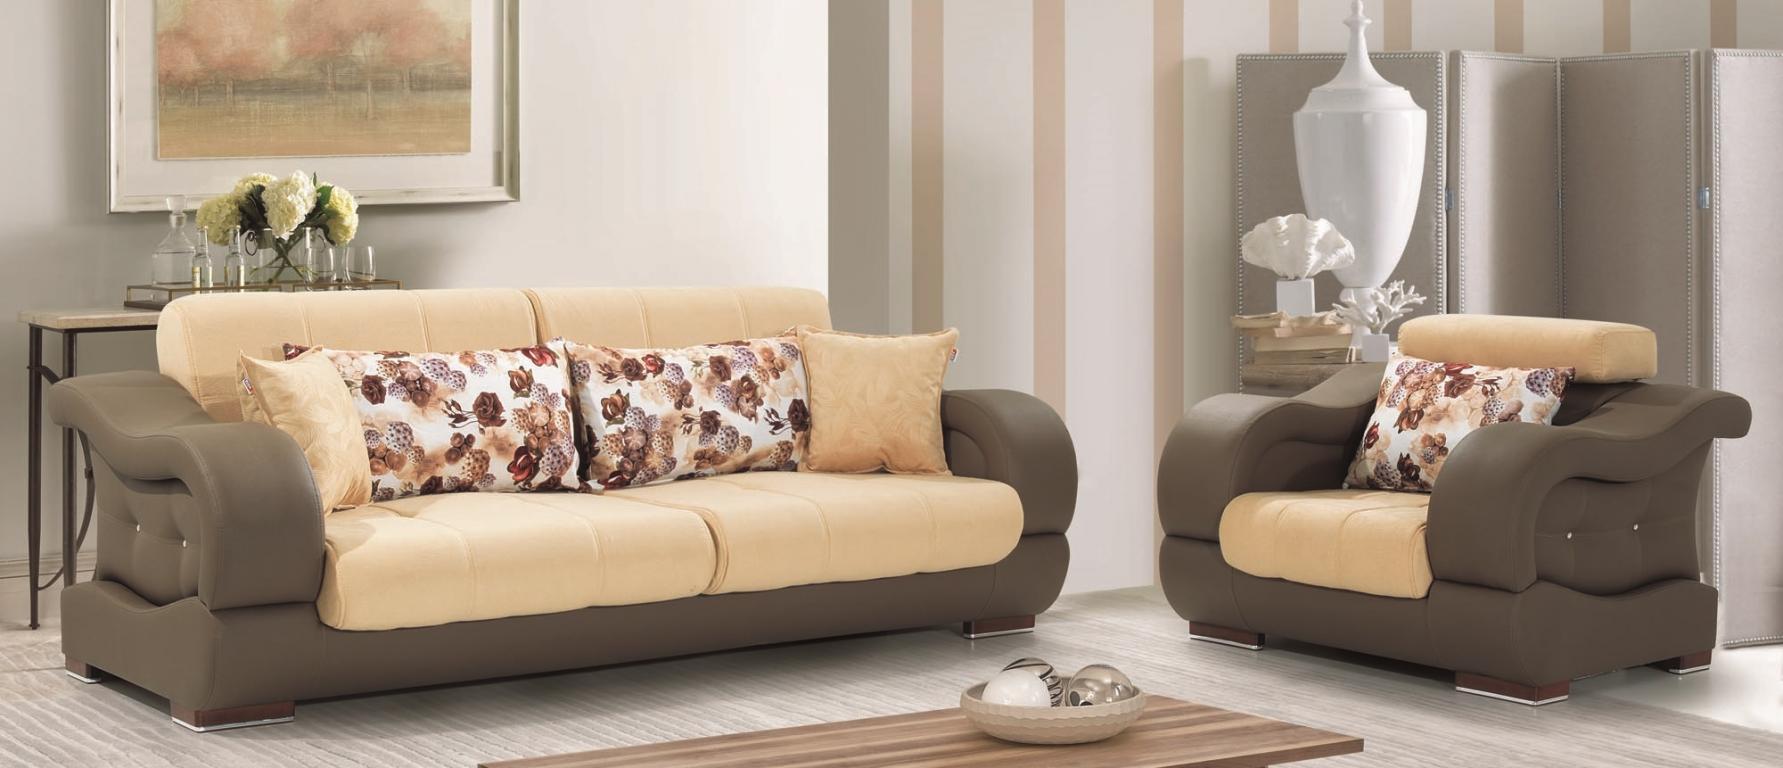 new truva 1 sofa set 3 2 1 yuvam m belhaus in wuppertal cilek offizieller h ndler in europa. Black Bedroom Furniture Sets. Home Design Ideas